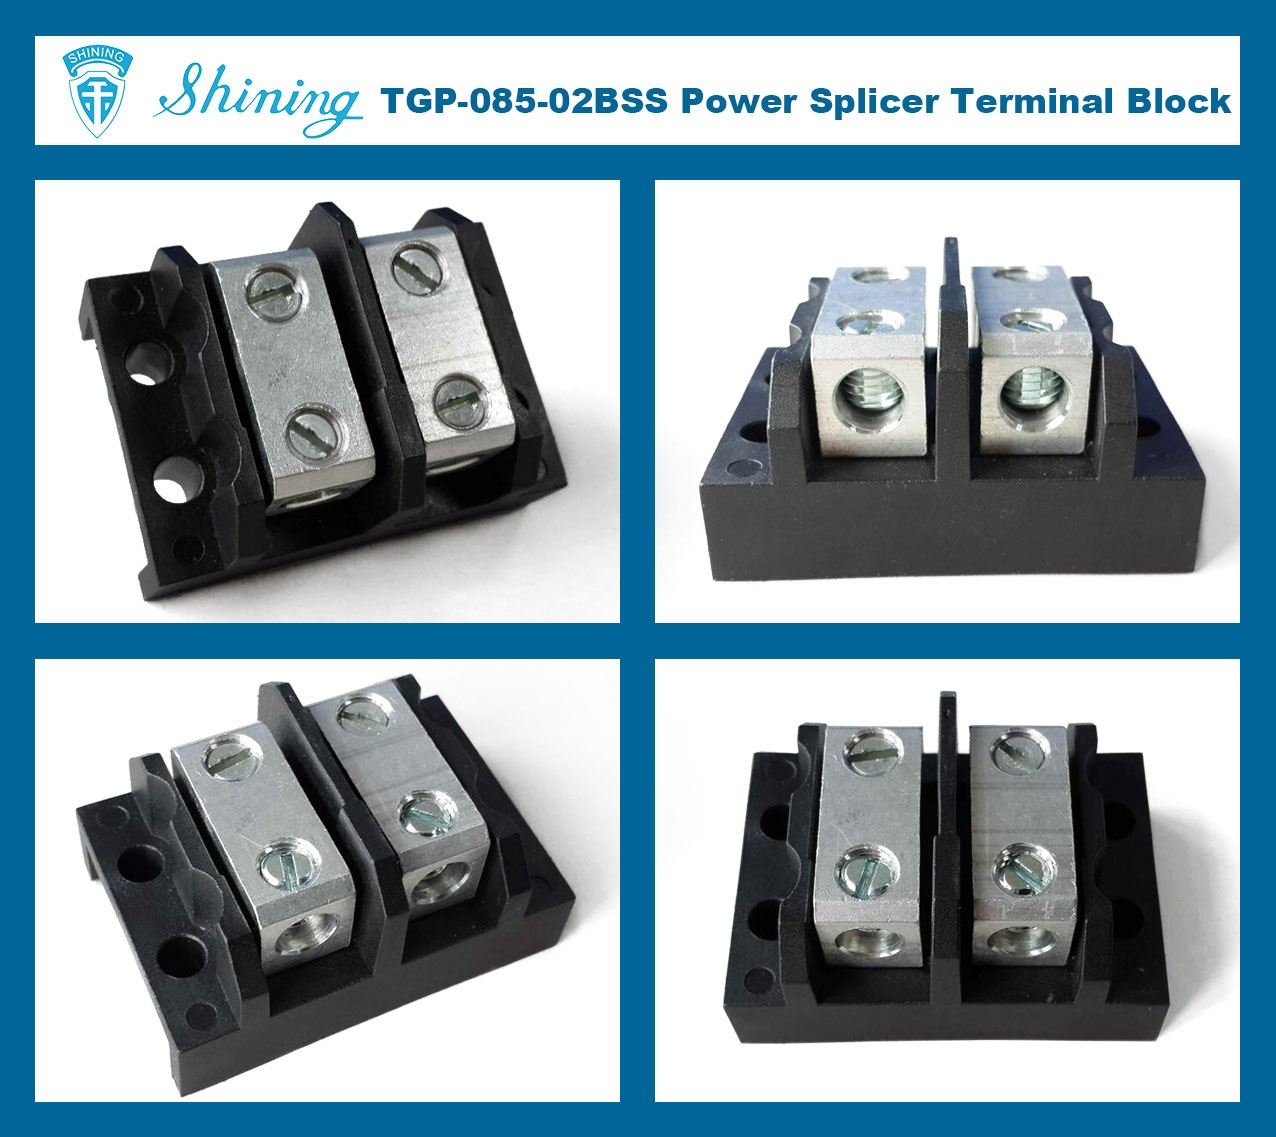 TGP-085-02BSS 600V 85A 2 Way Power Splicer Terminal Block